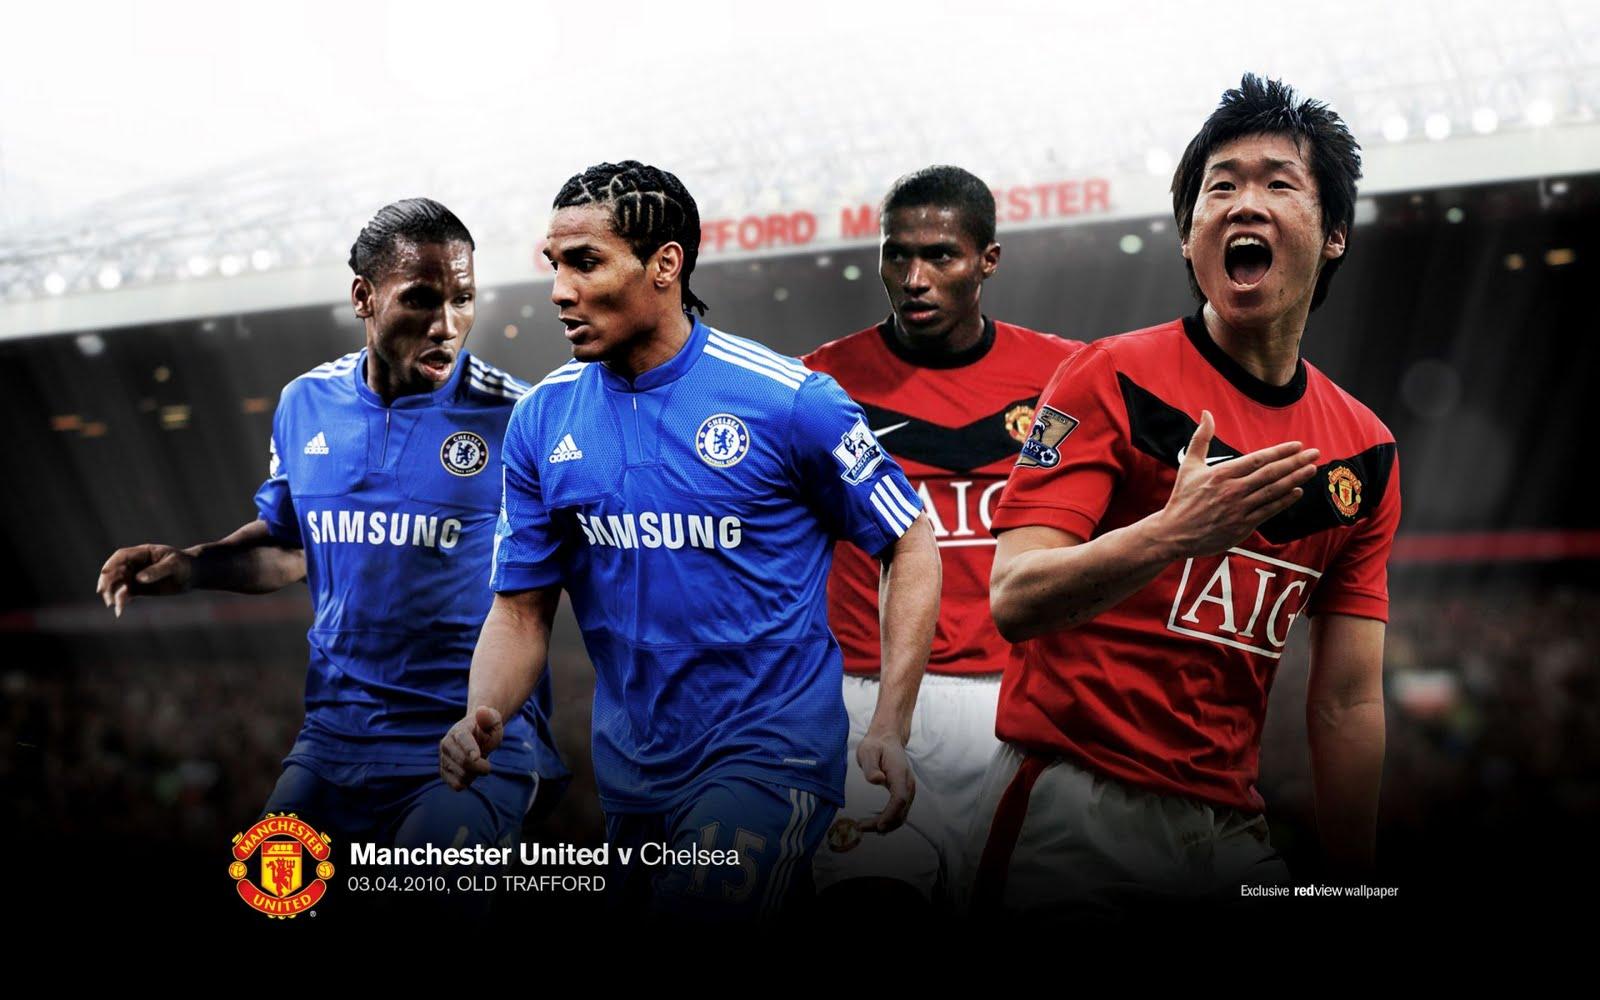 Chelsea Vs Manchester United Vs Fc Barcelona: MANCHESTER UNITED FC: Manchester United Vs Chelsea 03/04/10